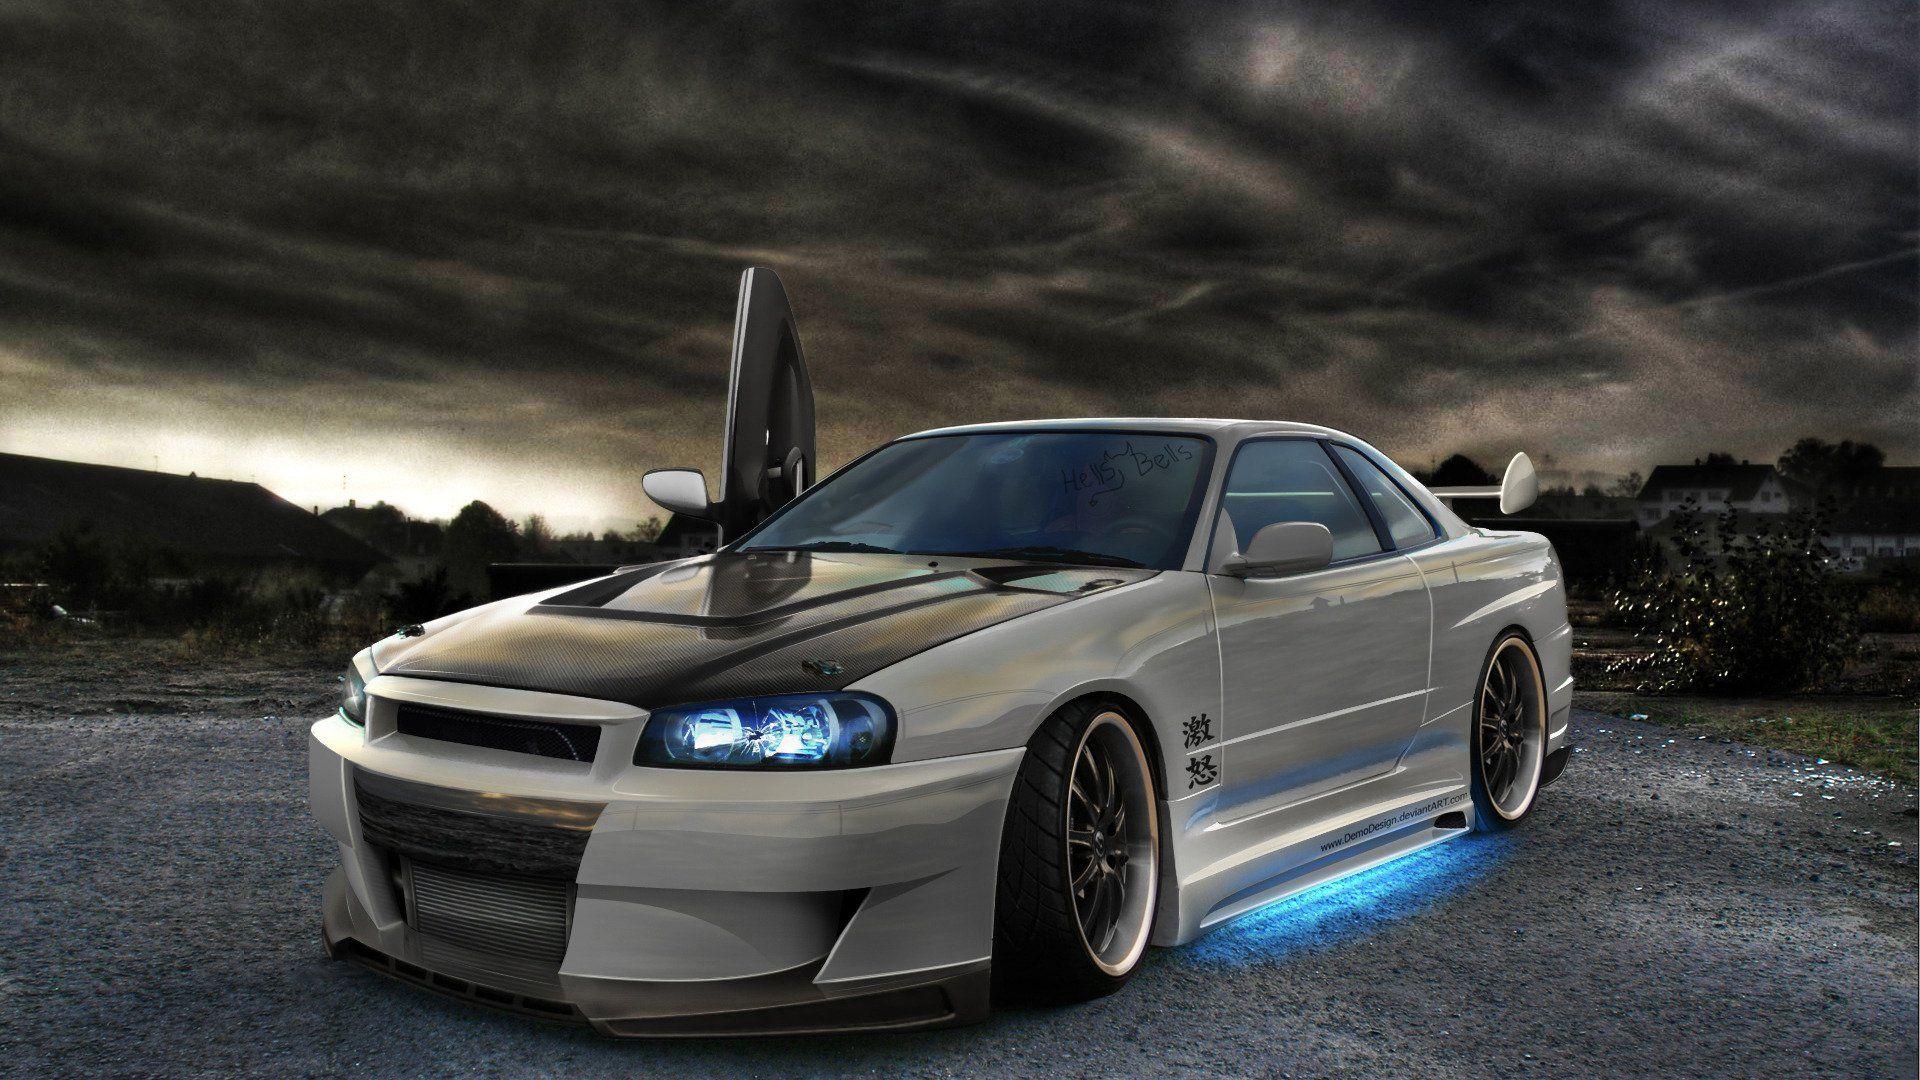 Skyline R Wallpapers Group × Nissan Skyline GTR R HD Wallpapers